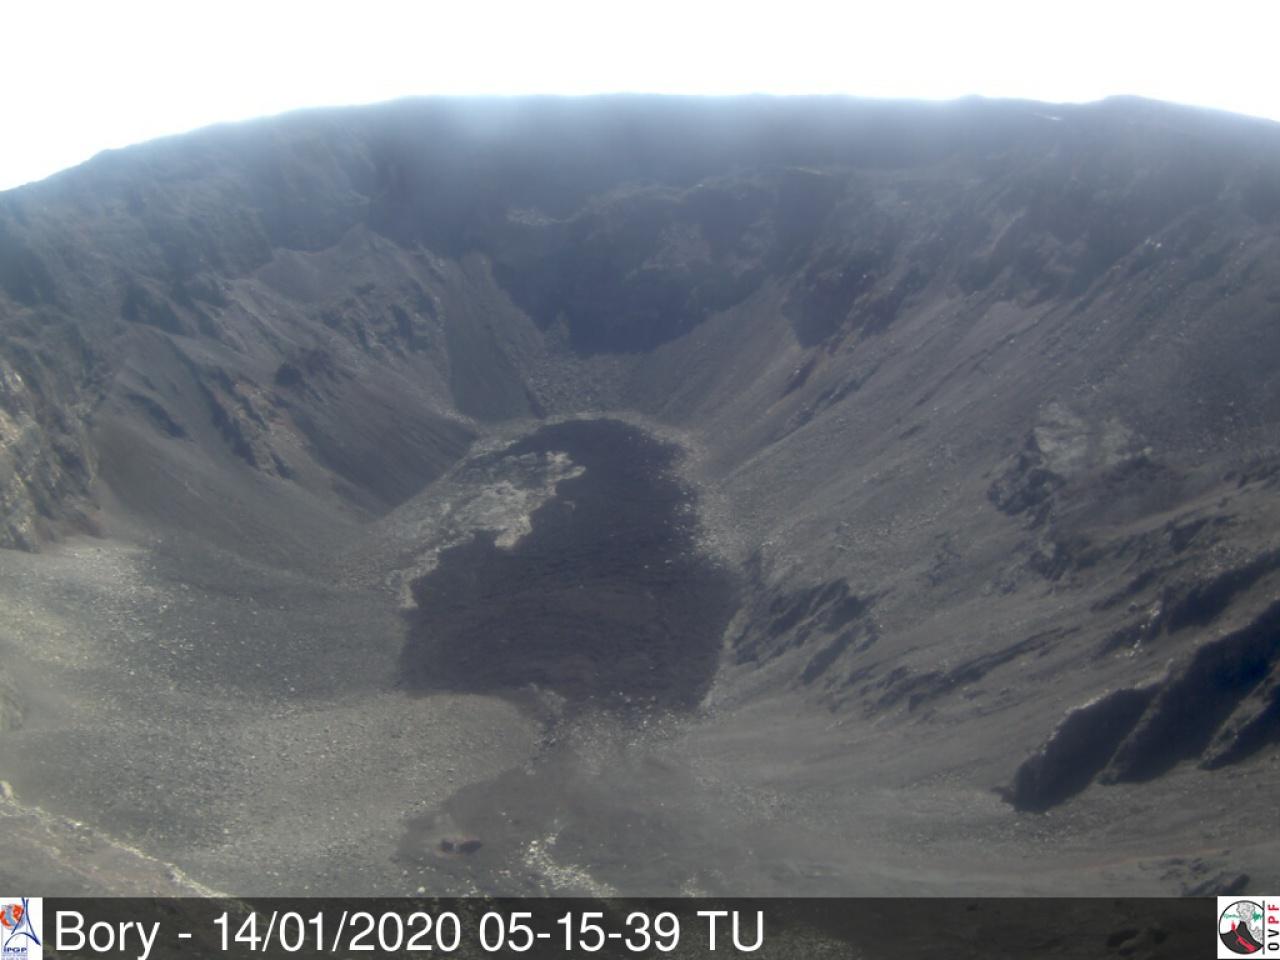 Dolomieu crater today (image: OVPF)